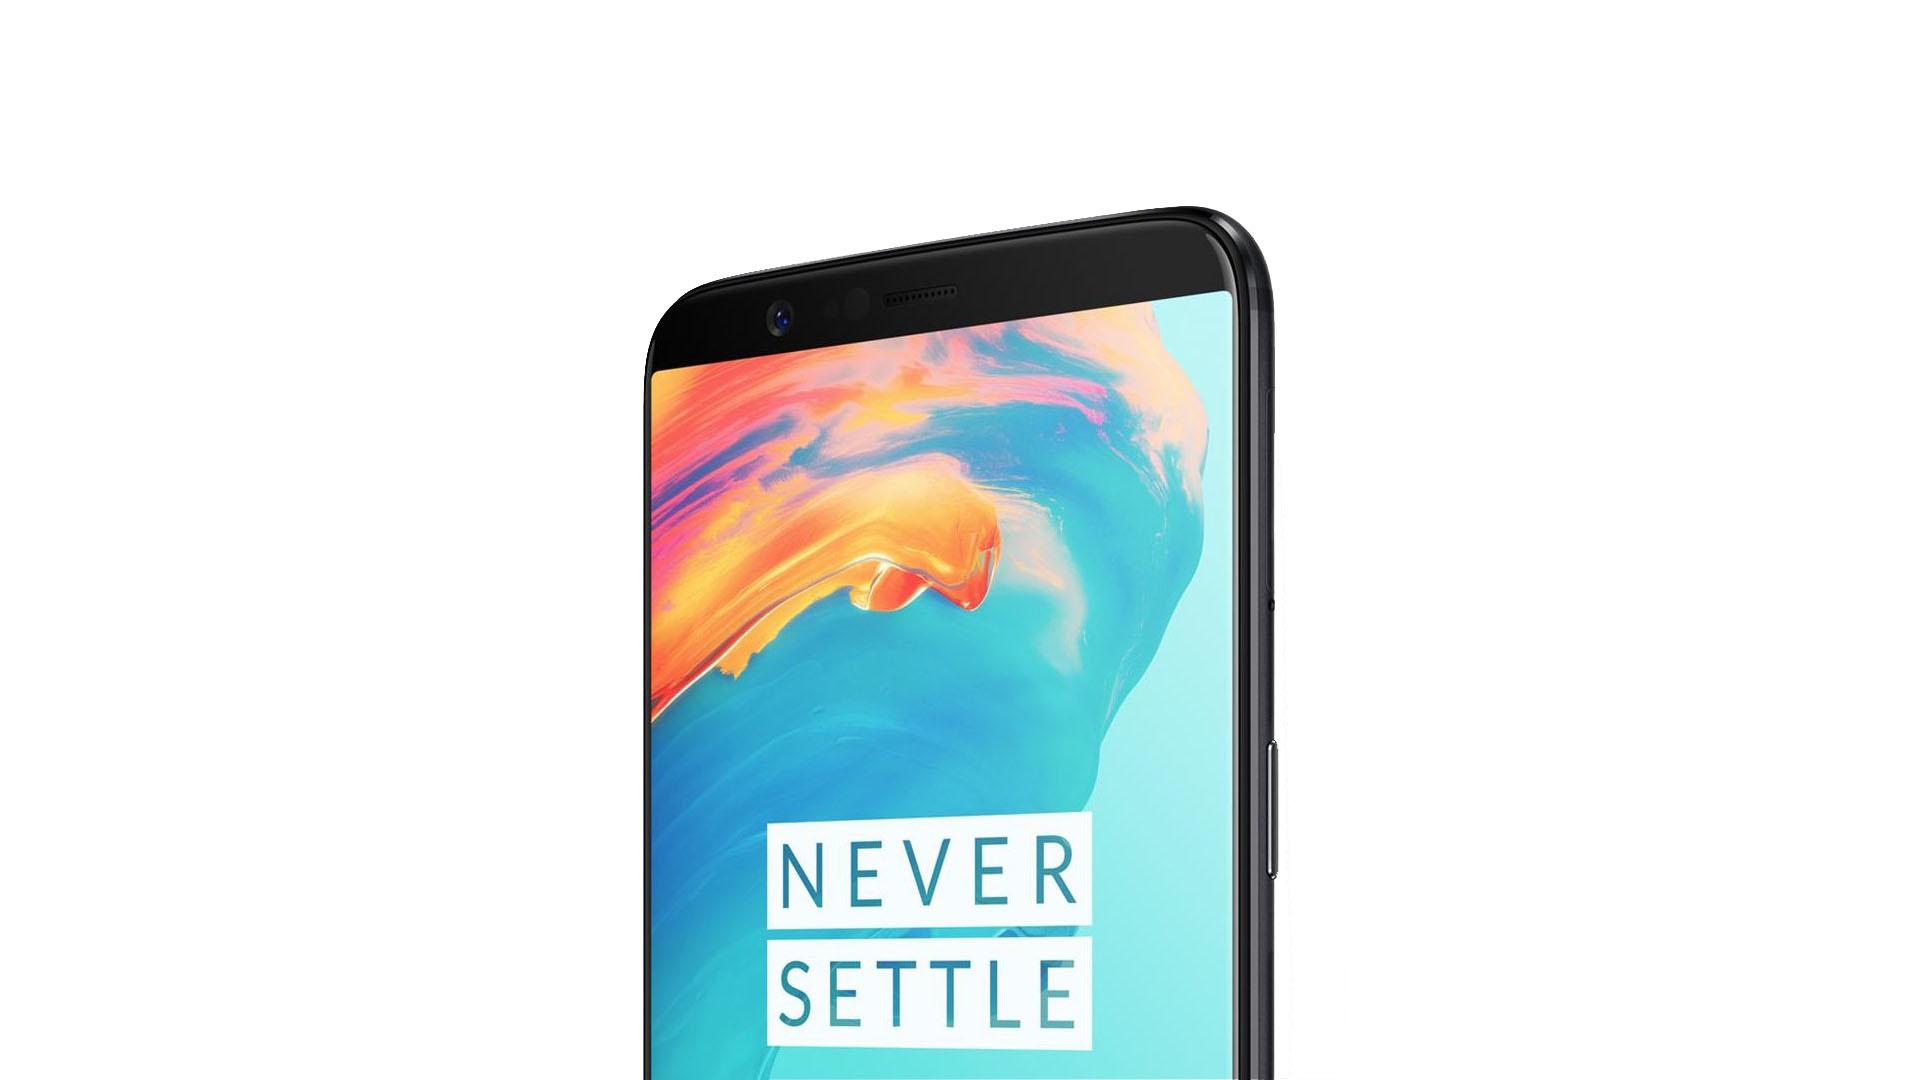 OnePlus T5 Smartphone